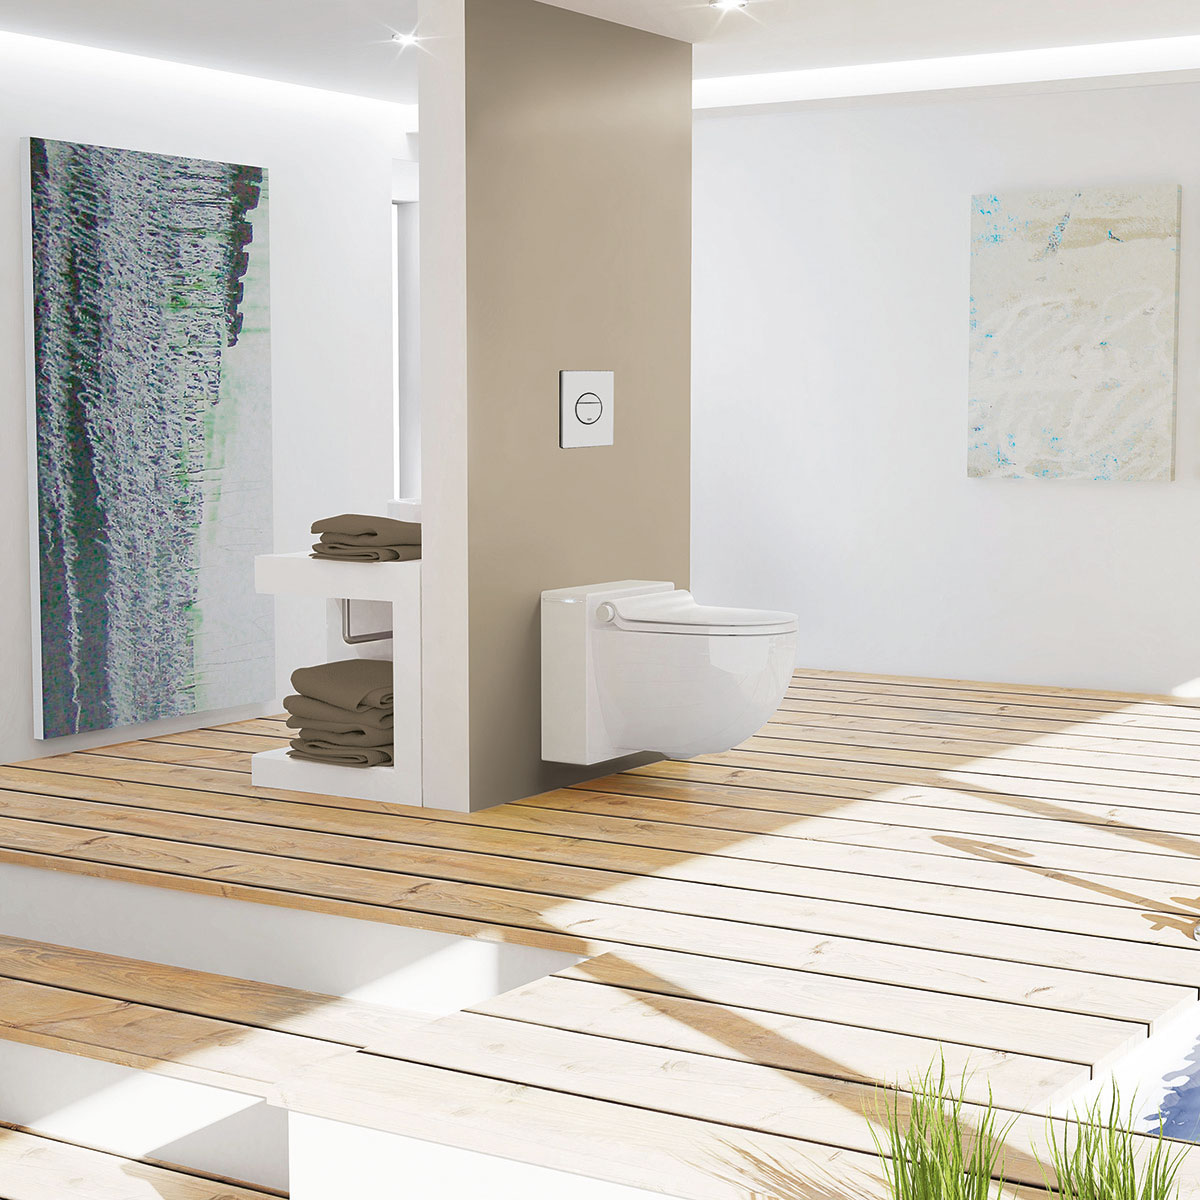 grohe sensia die neue generation dusch wc. Black Bedroom Furniture Sets. Home Design Ideas